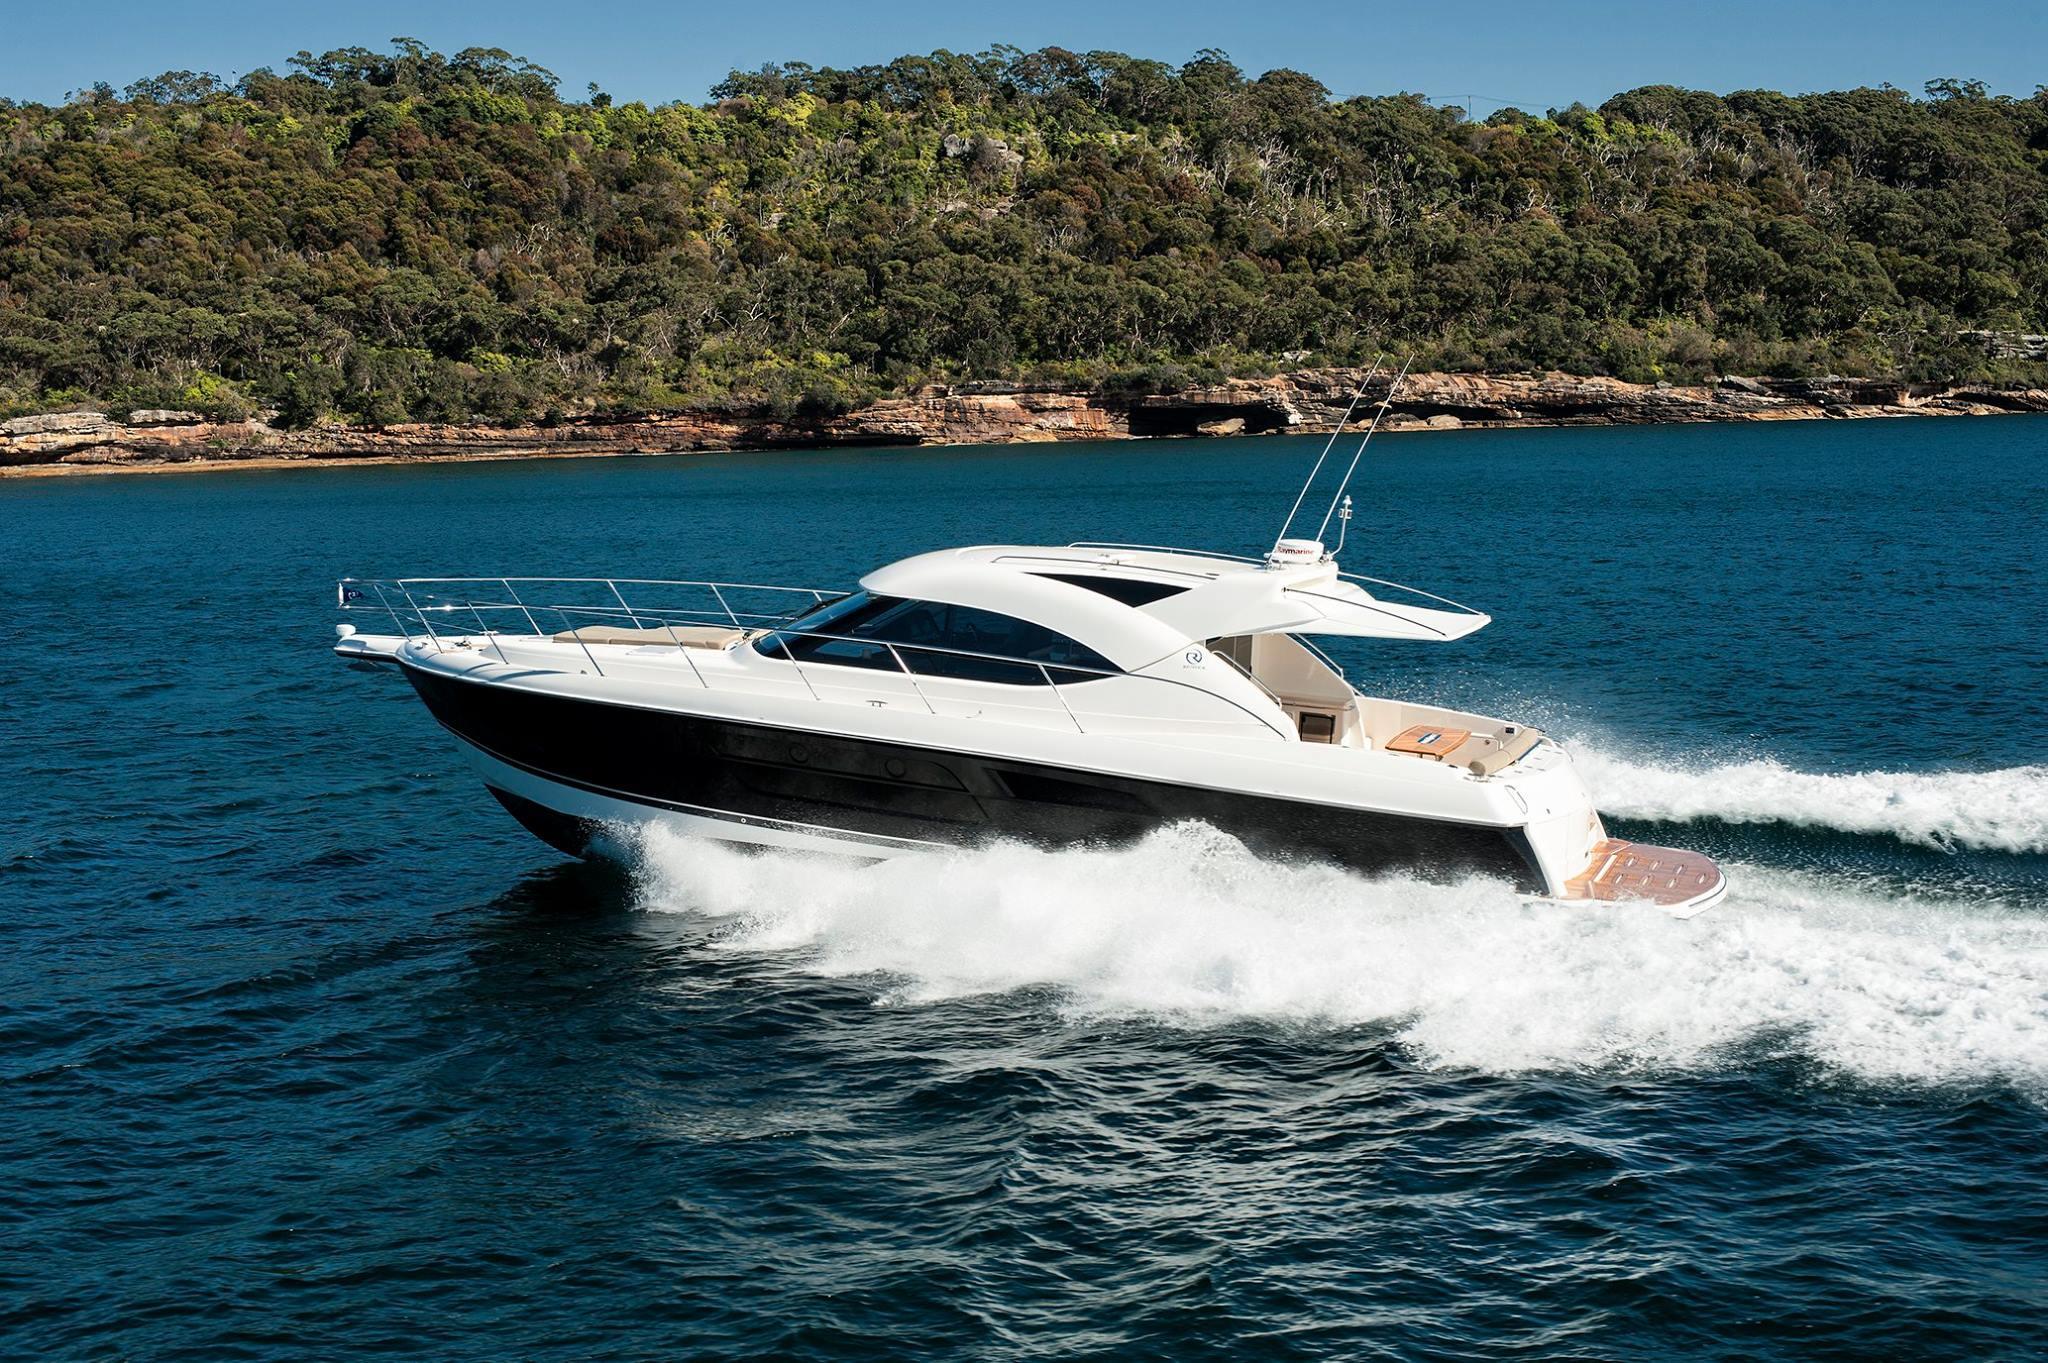 Grande Yachts image 2